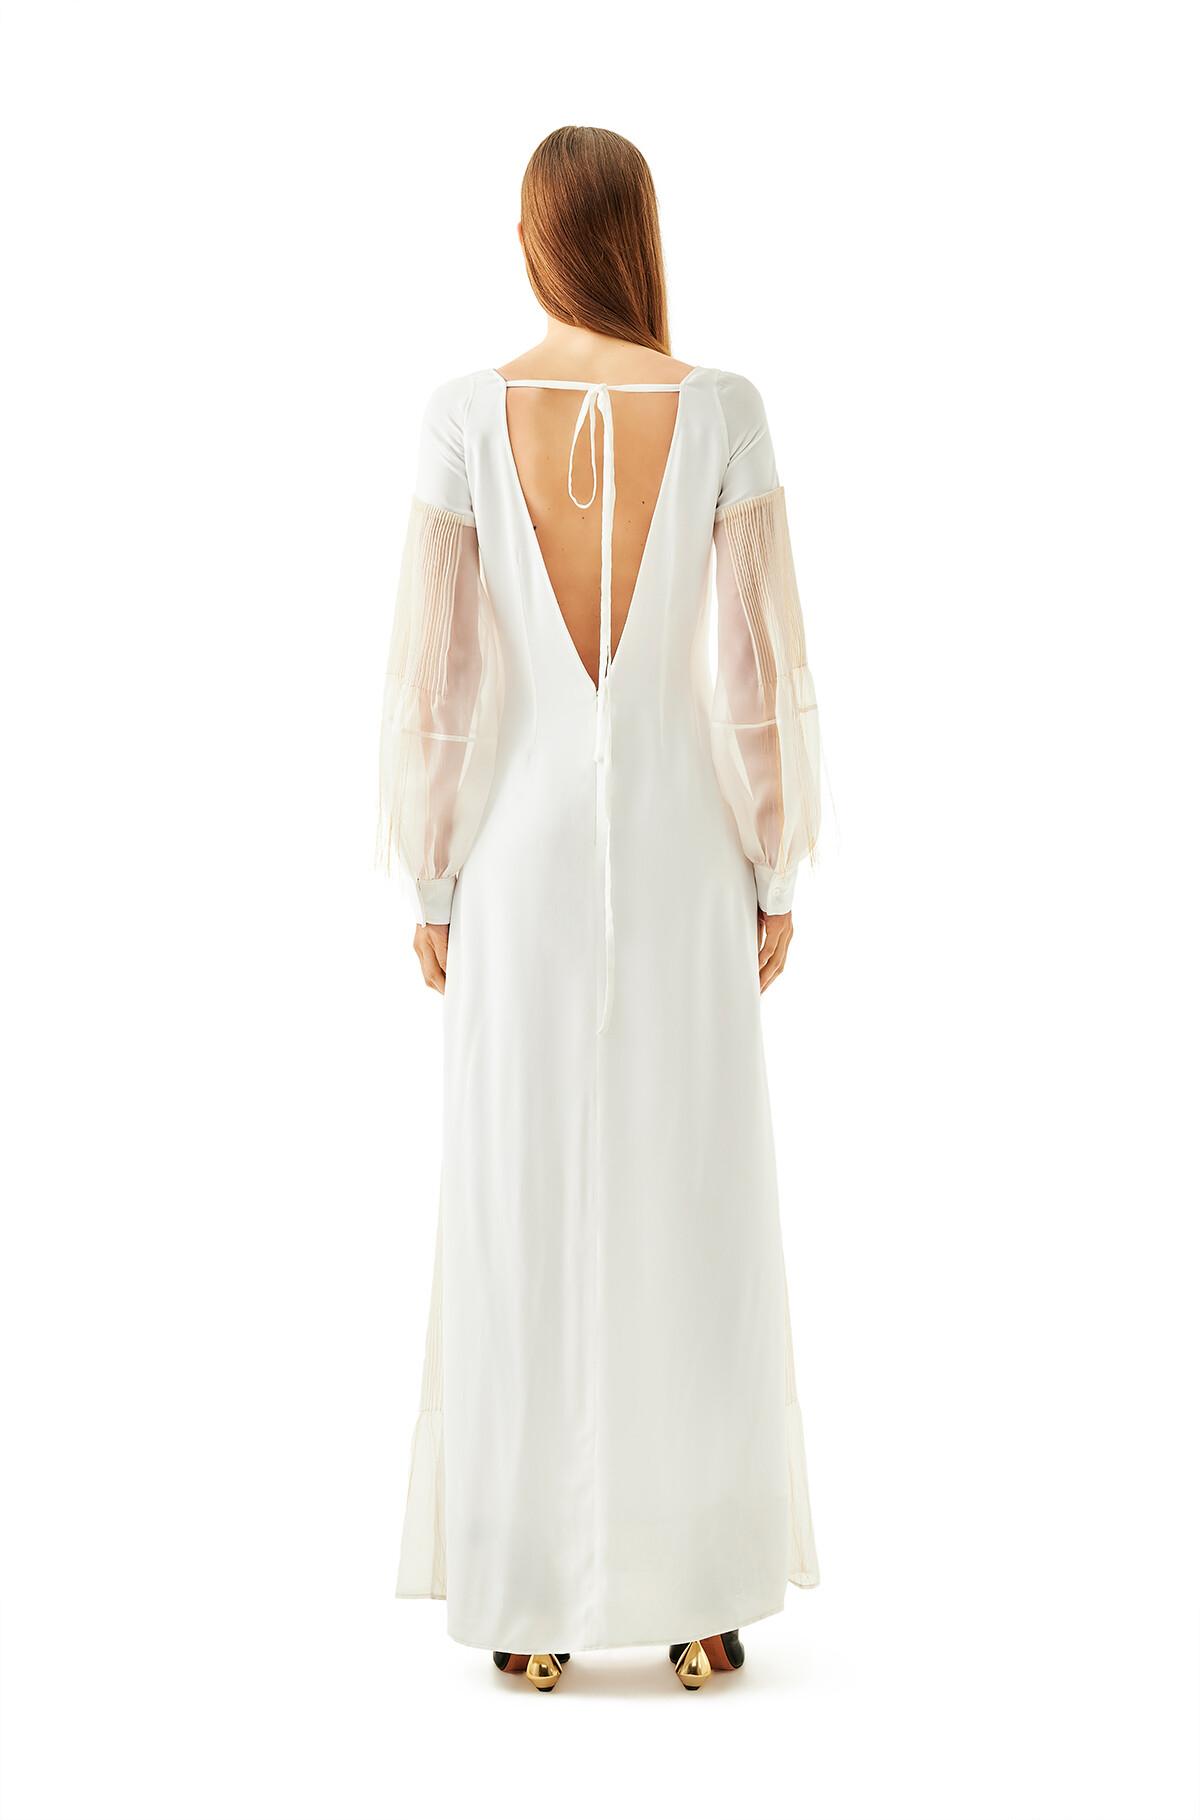 LOEWE Golden String Dress White front